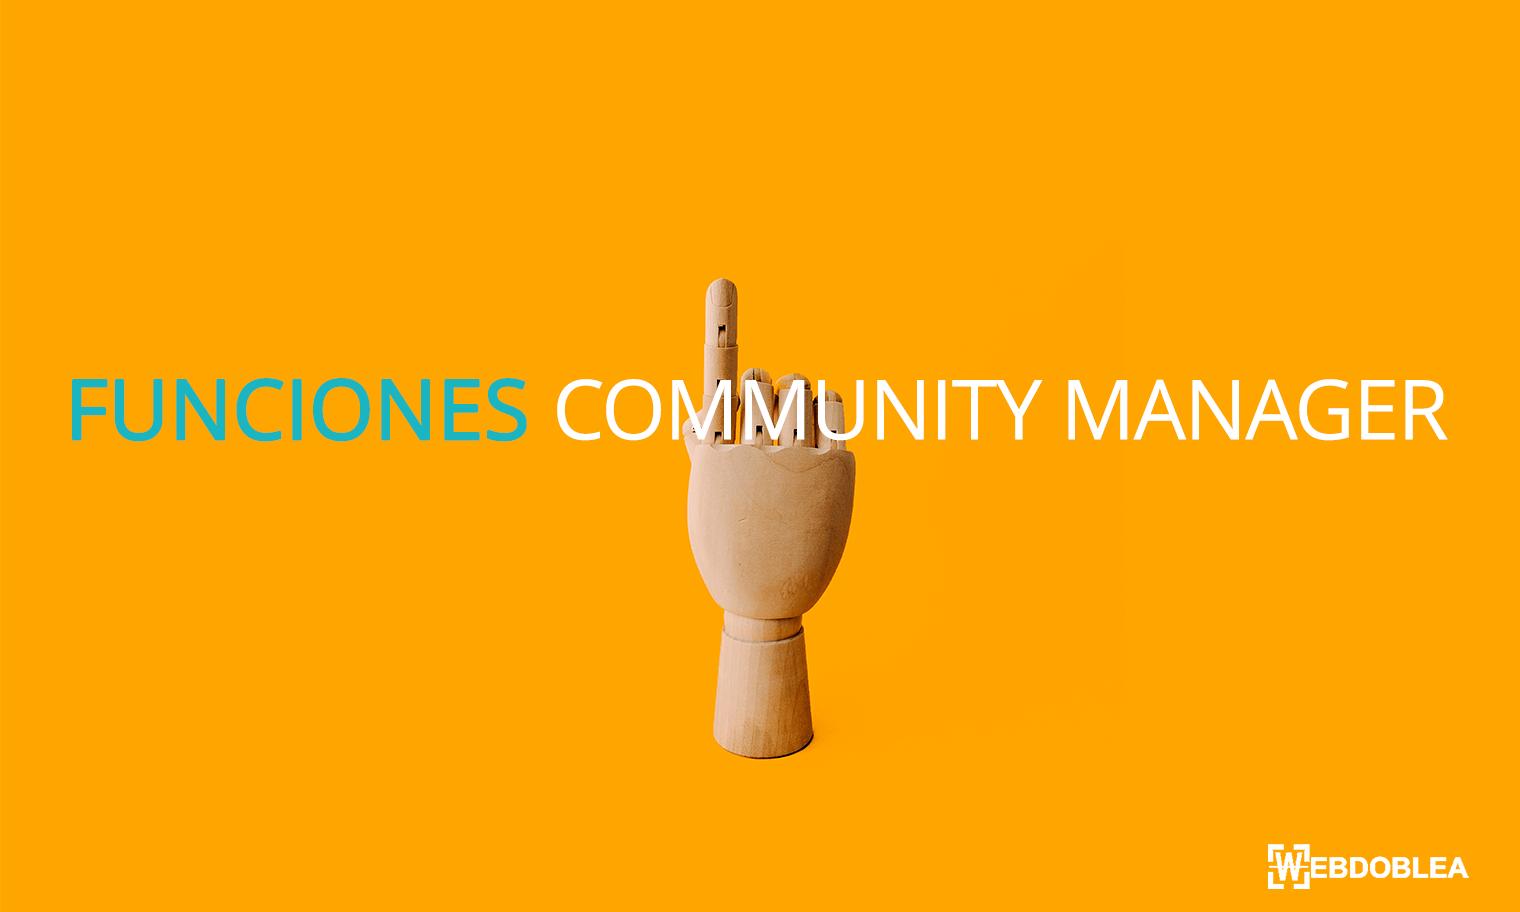 funciones_community_manager